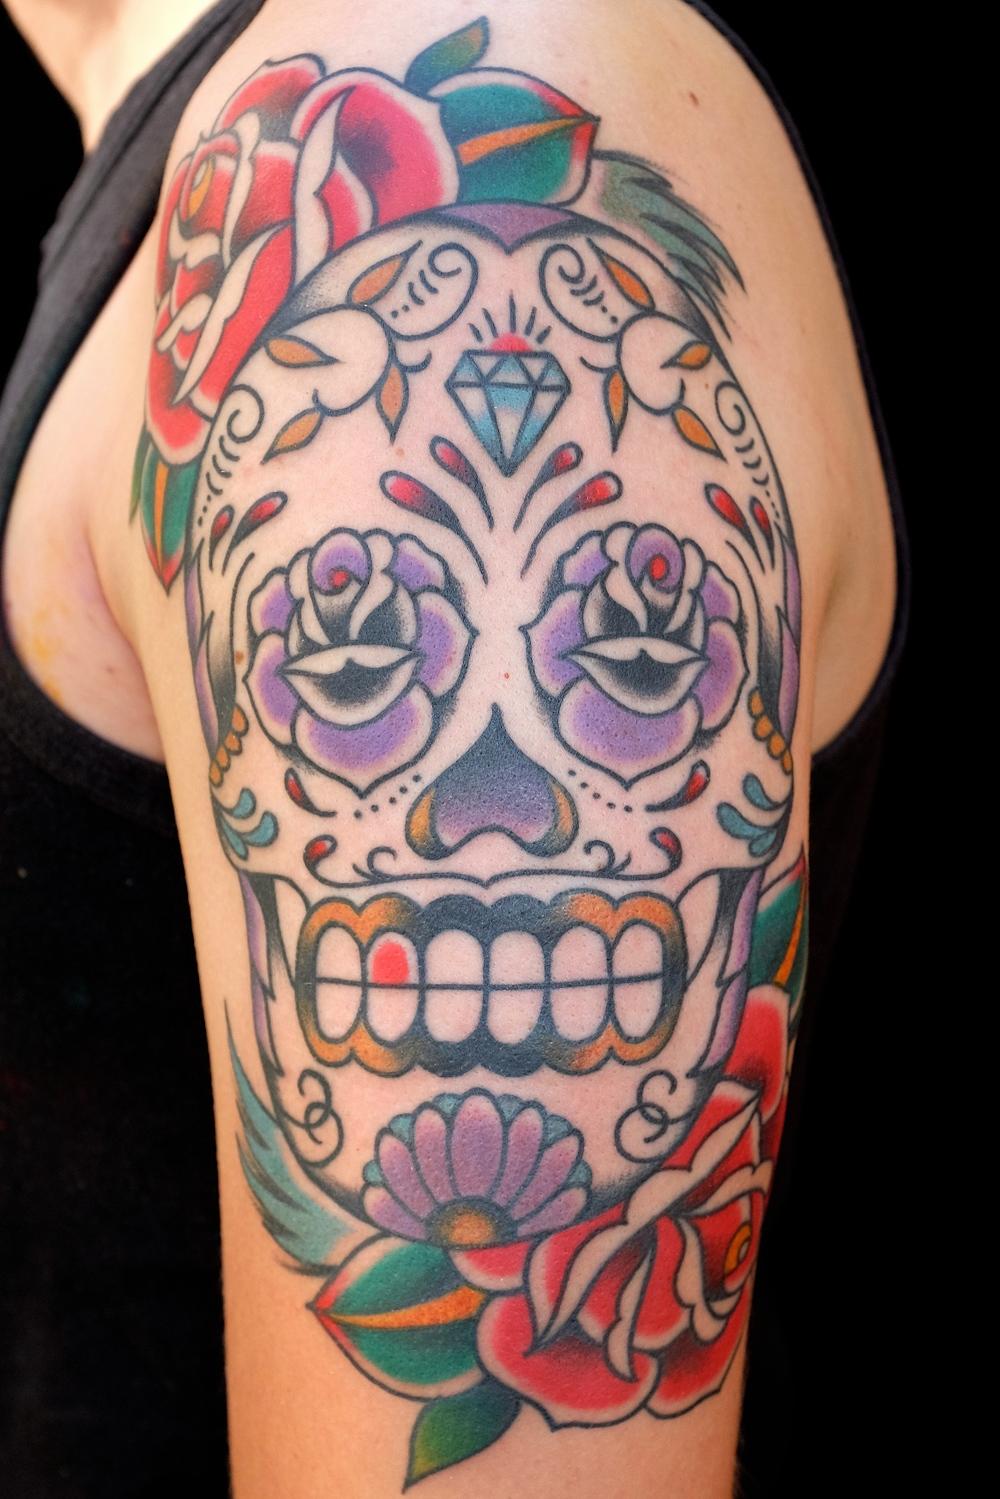 01082013 Tattoos 16.jpg